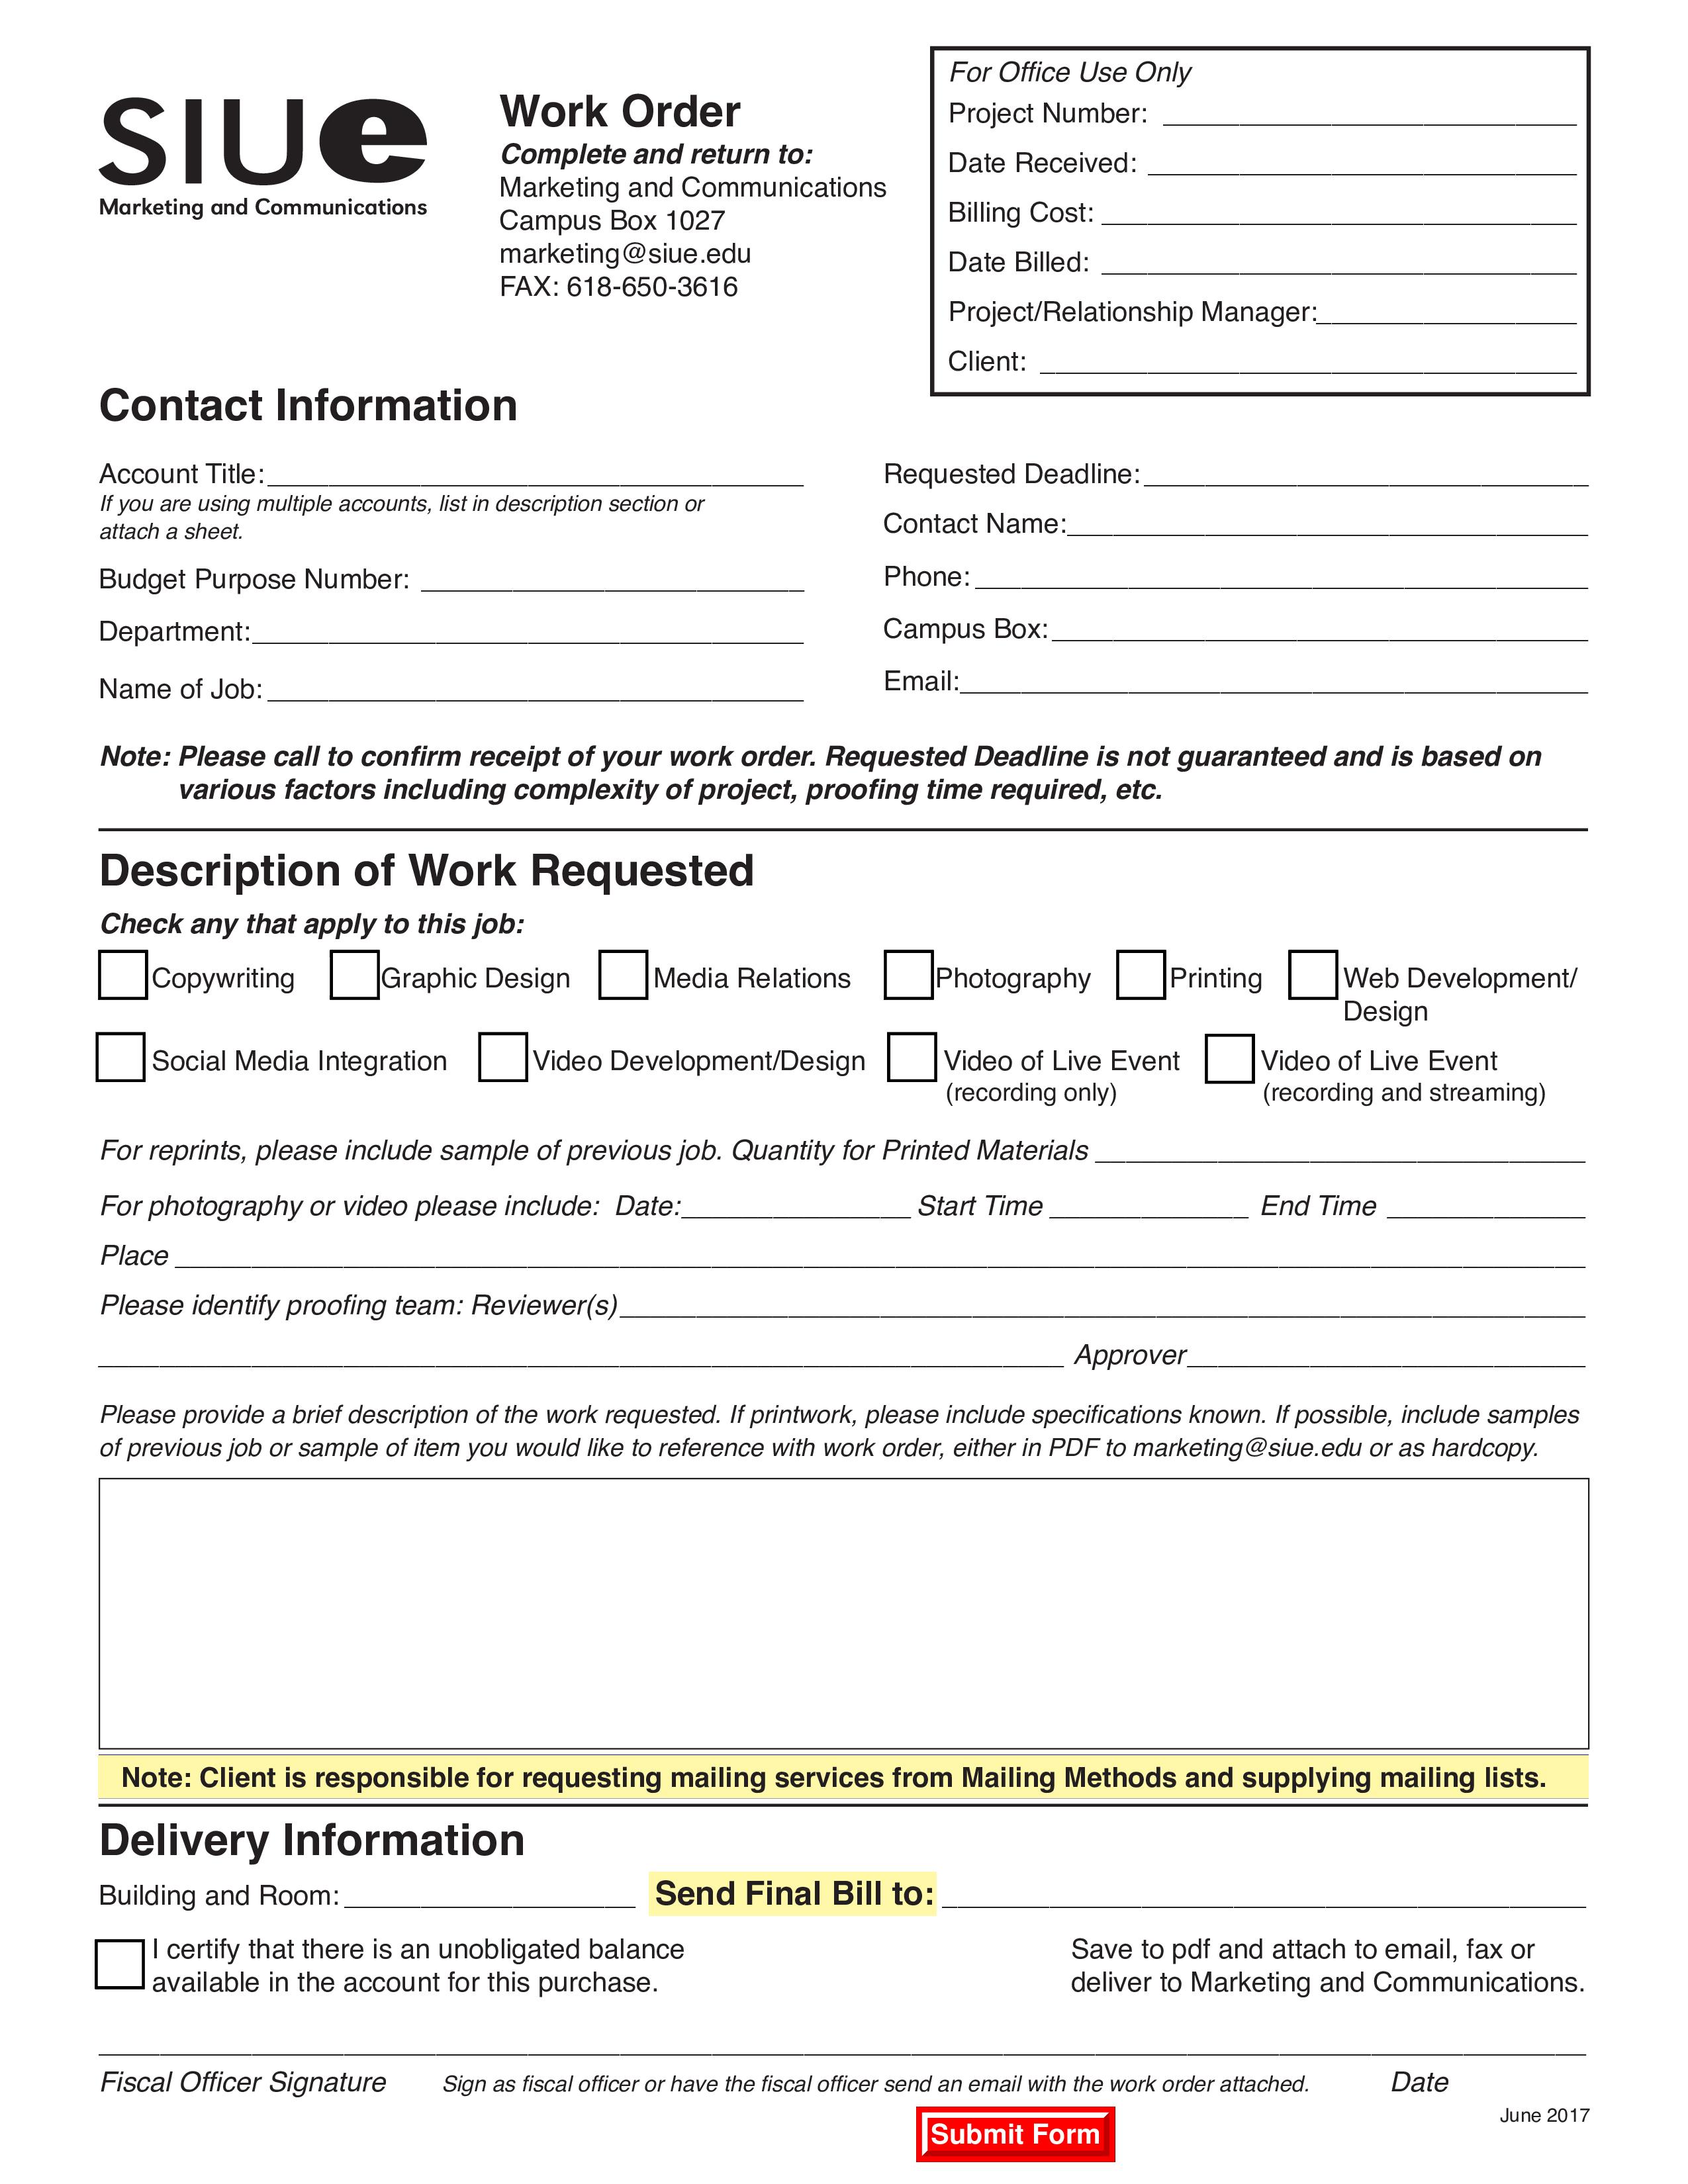 Free Job Work Order Templates At Allbusinesstemplatescom - Graphic design work order template